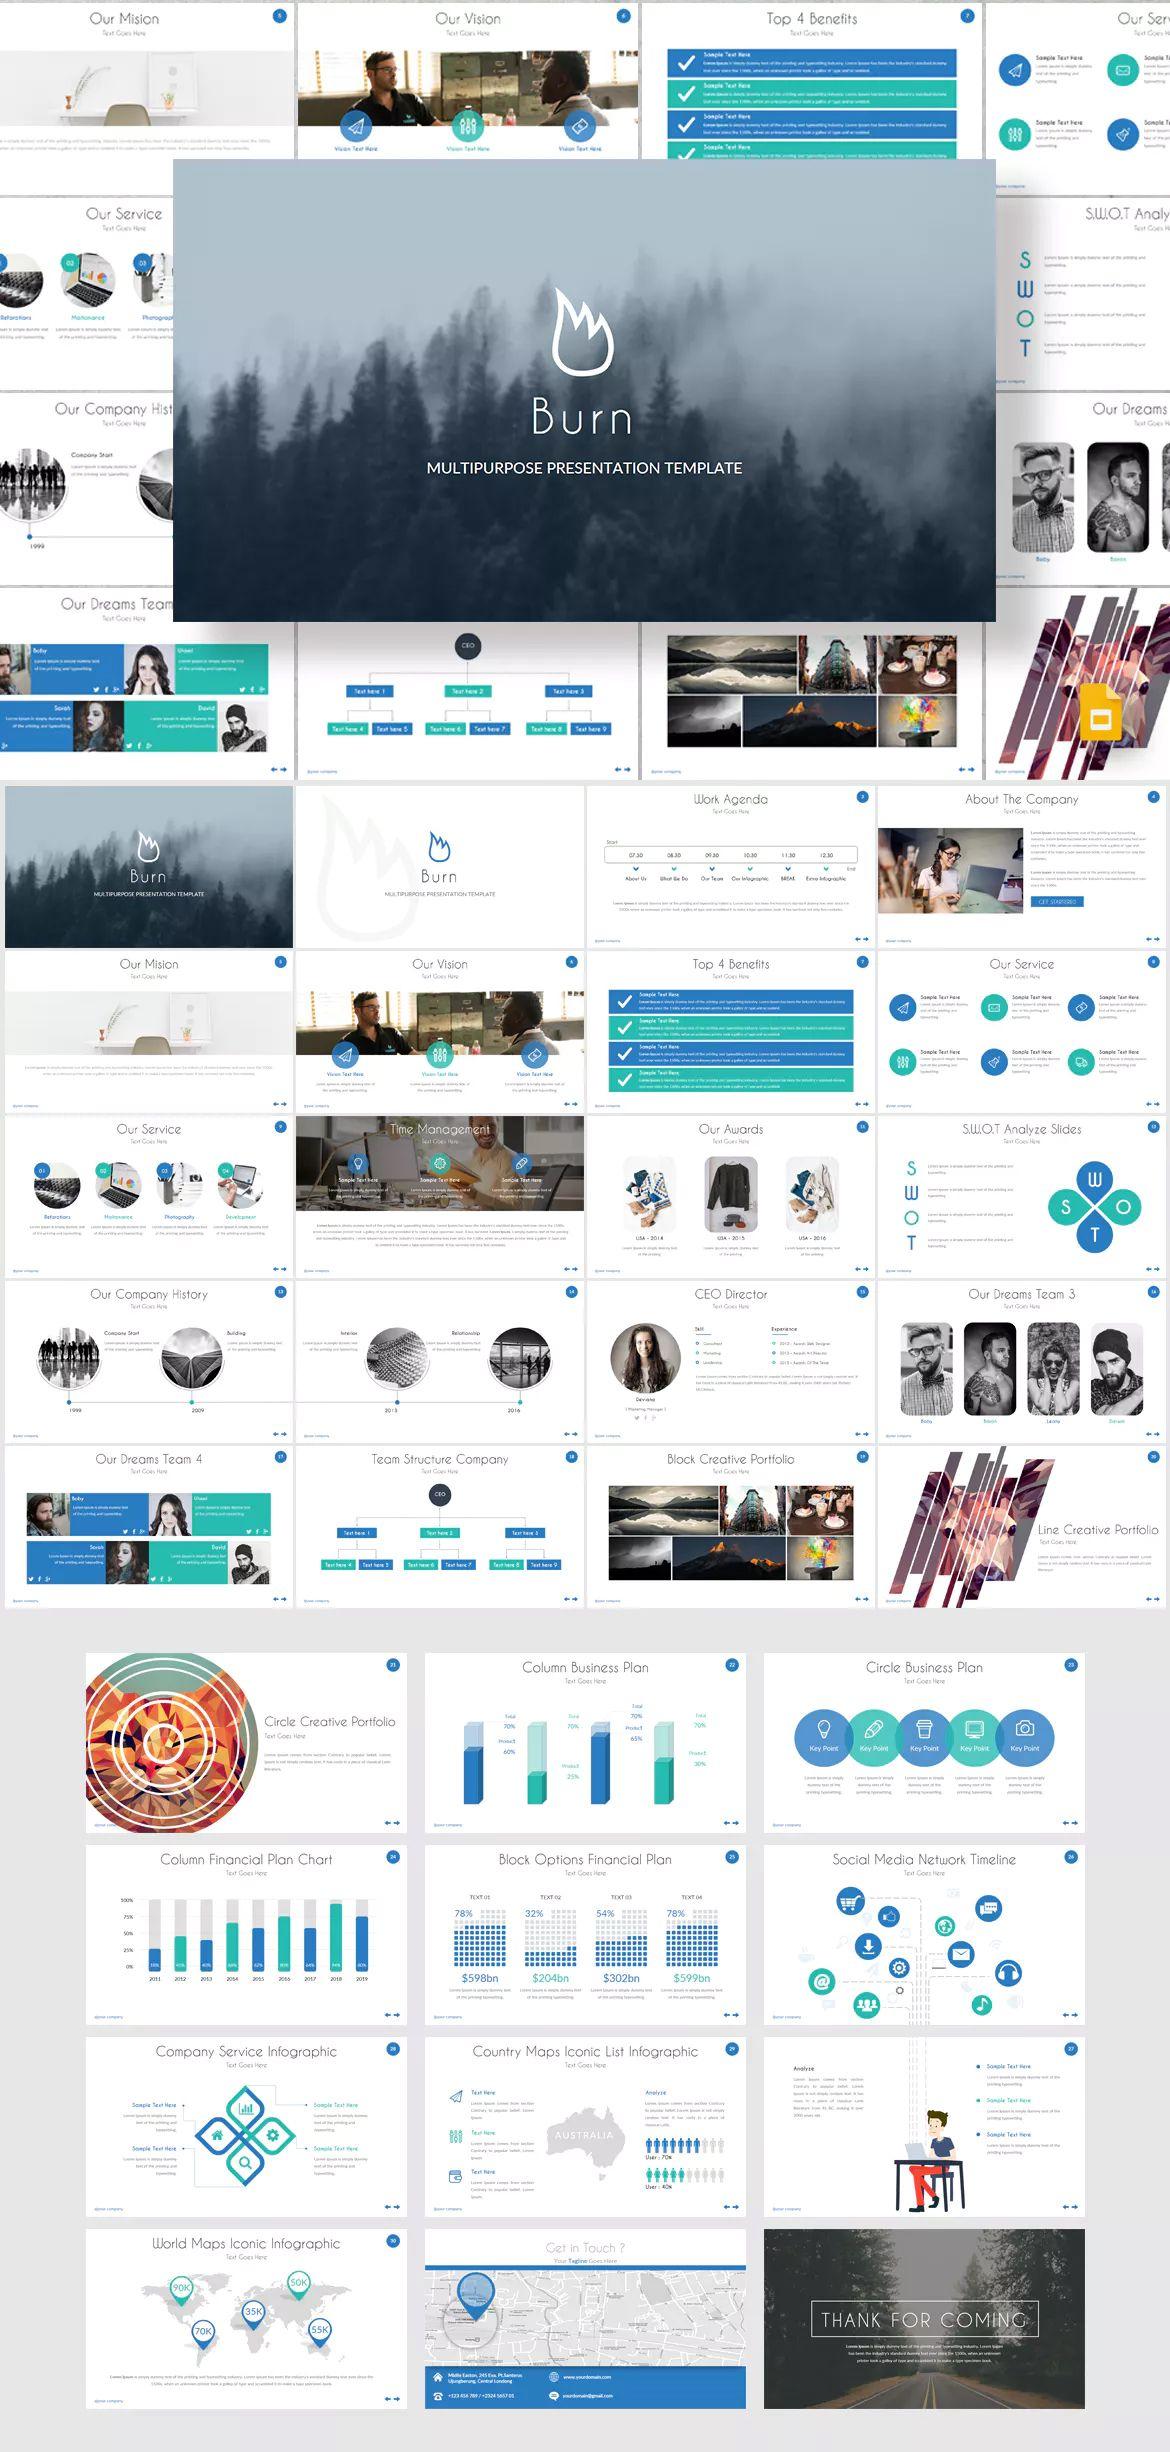 Burn Google Slides Template By Inspirasign On Powerpoint